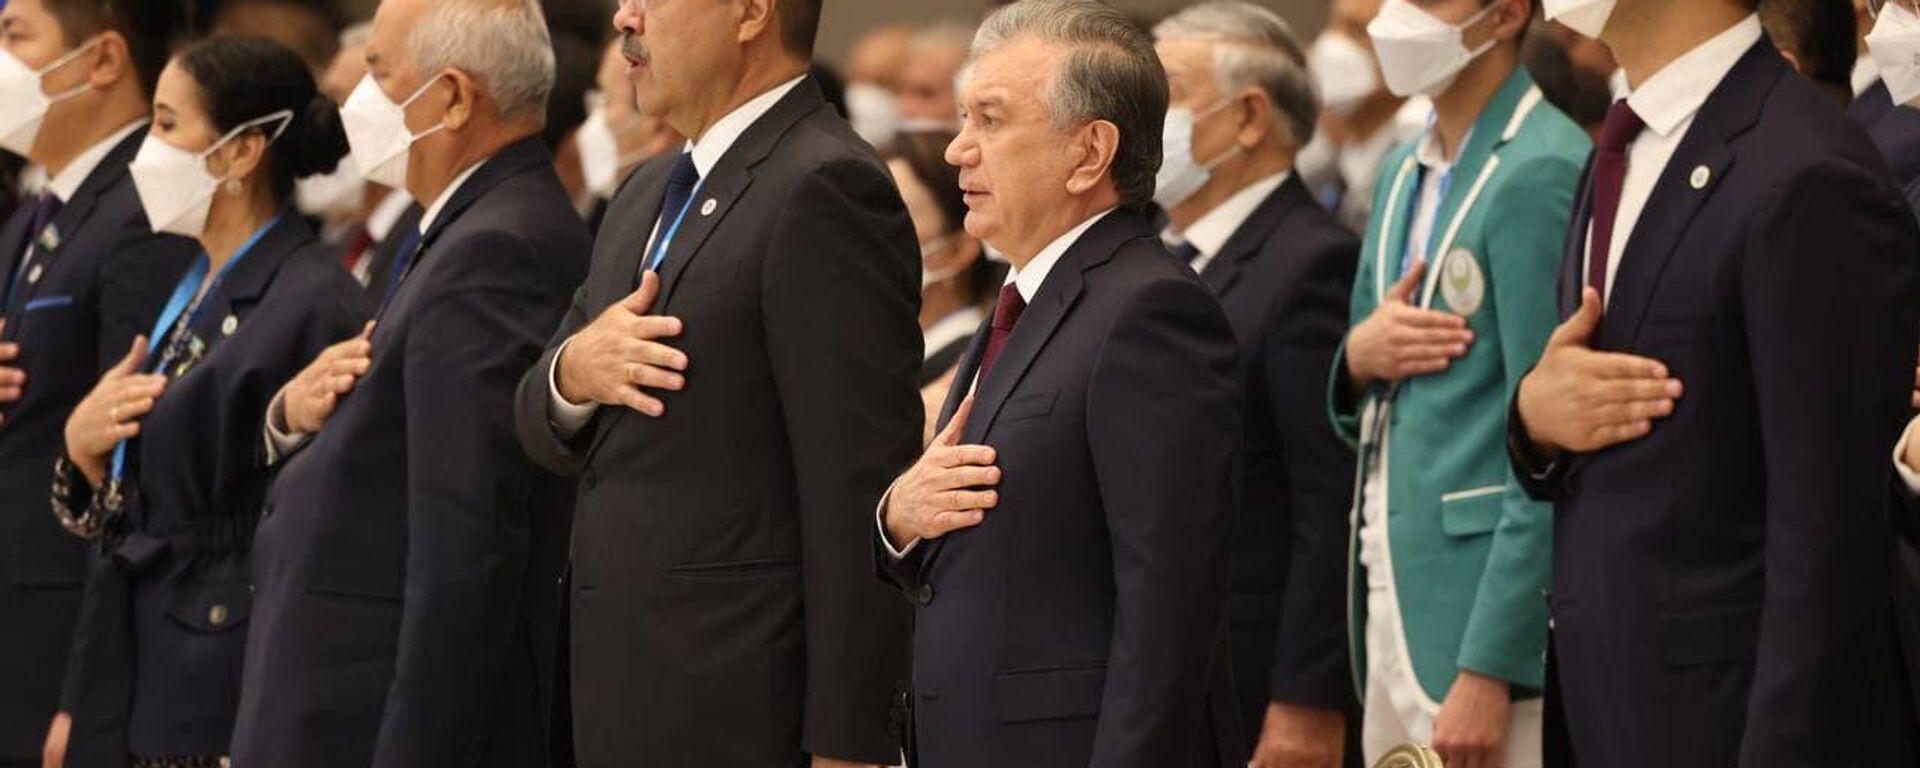 Шавкат Мирзиёев на съезде ЎзЛиДеп  - Sputnik Узбекистан, 1920, 09.09.2021